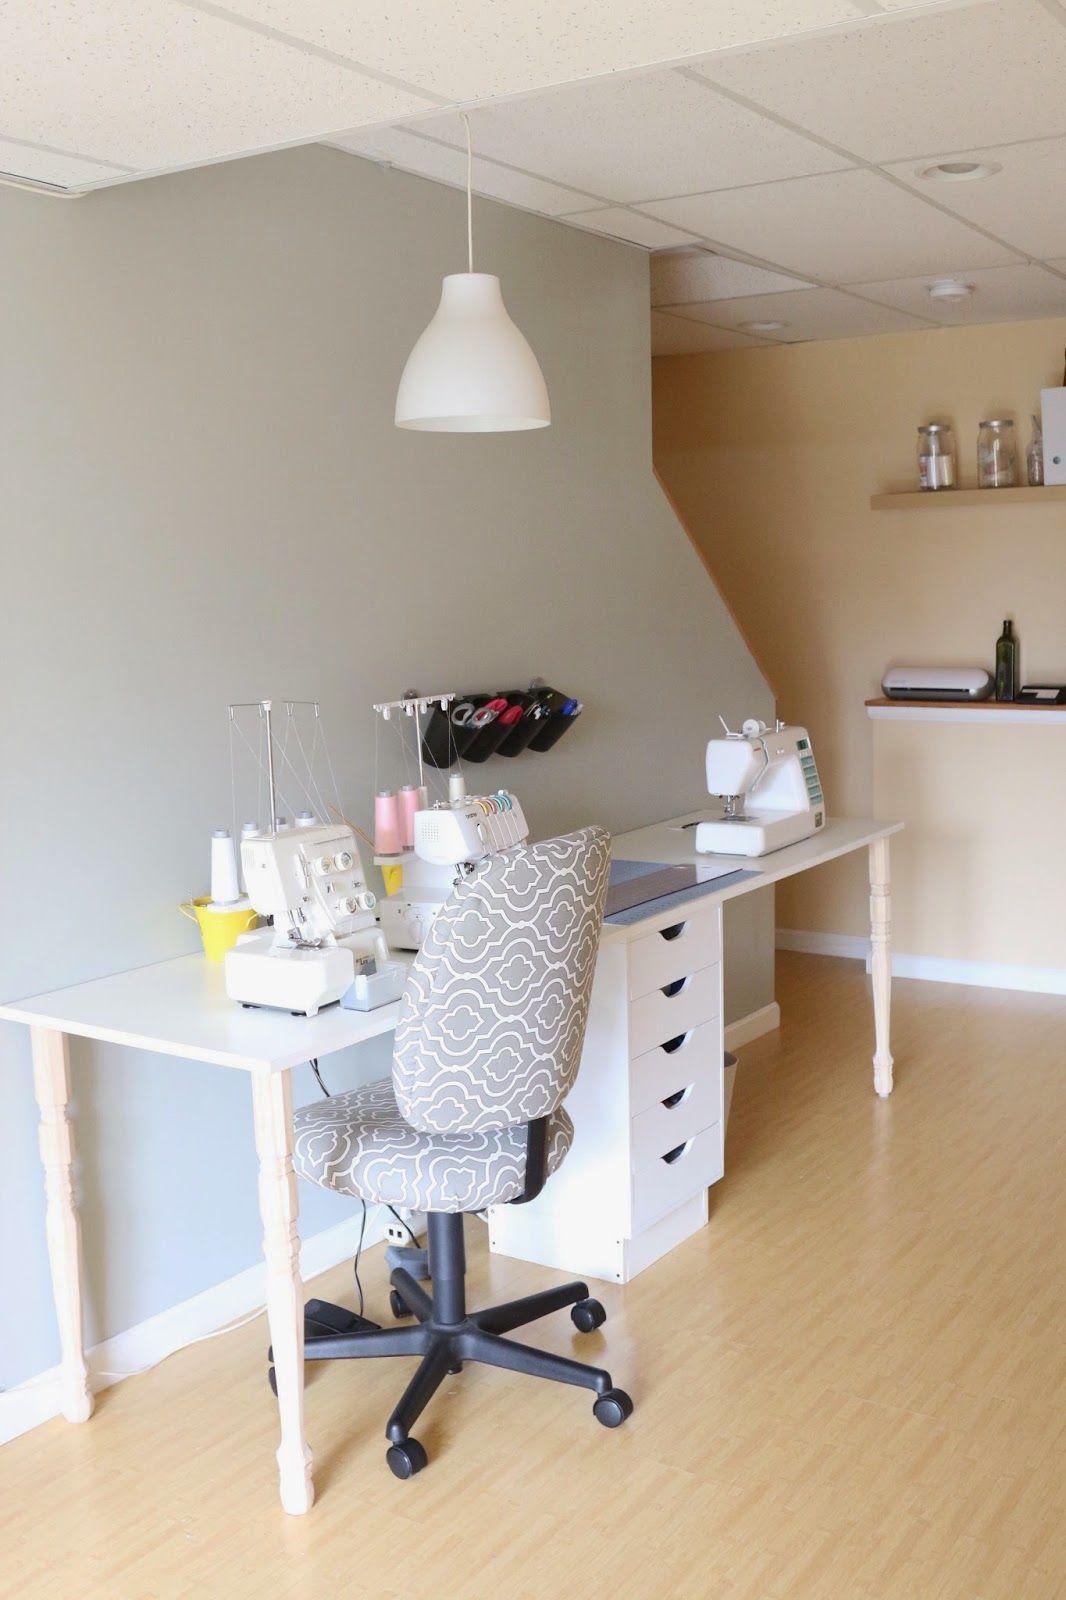 zaaberry diy ikea knockoff sewing table dream space ikea rh pinterest com